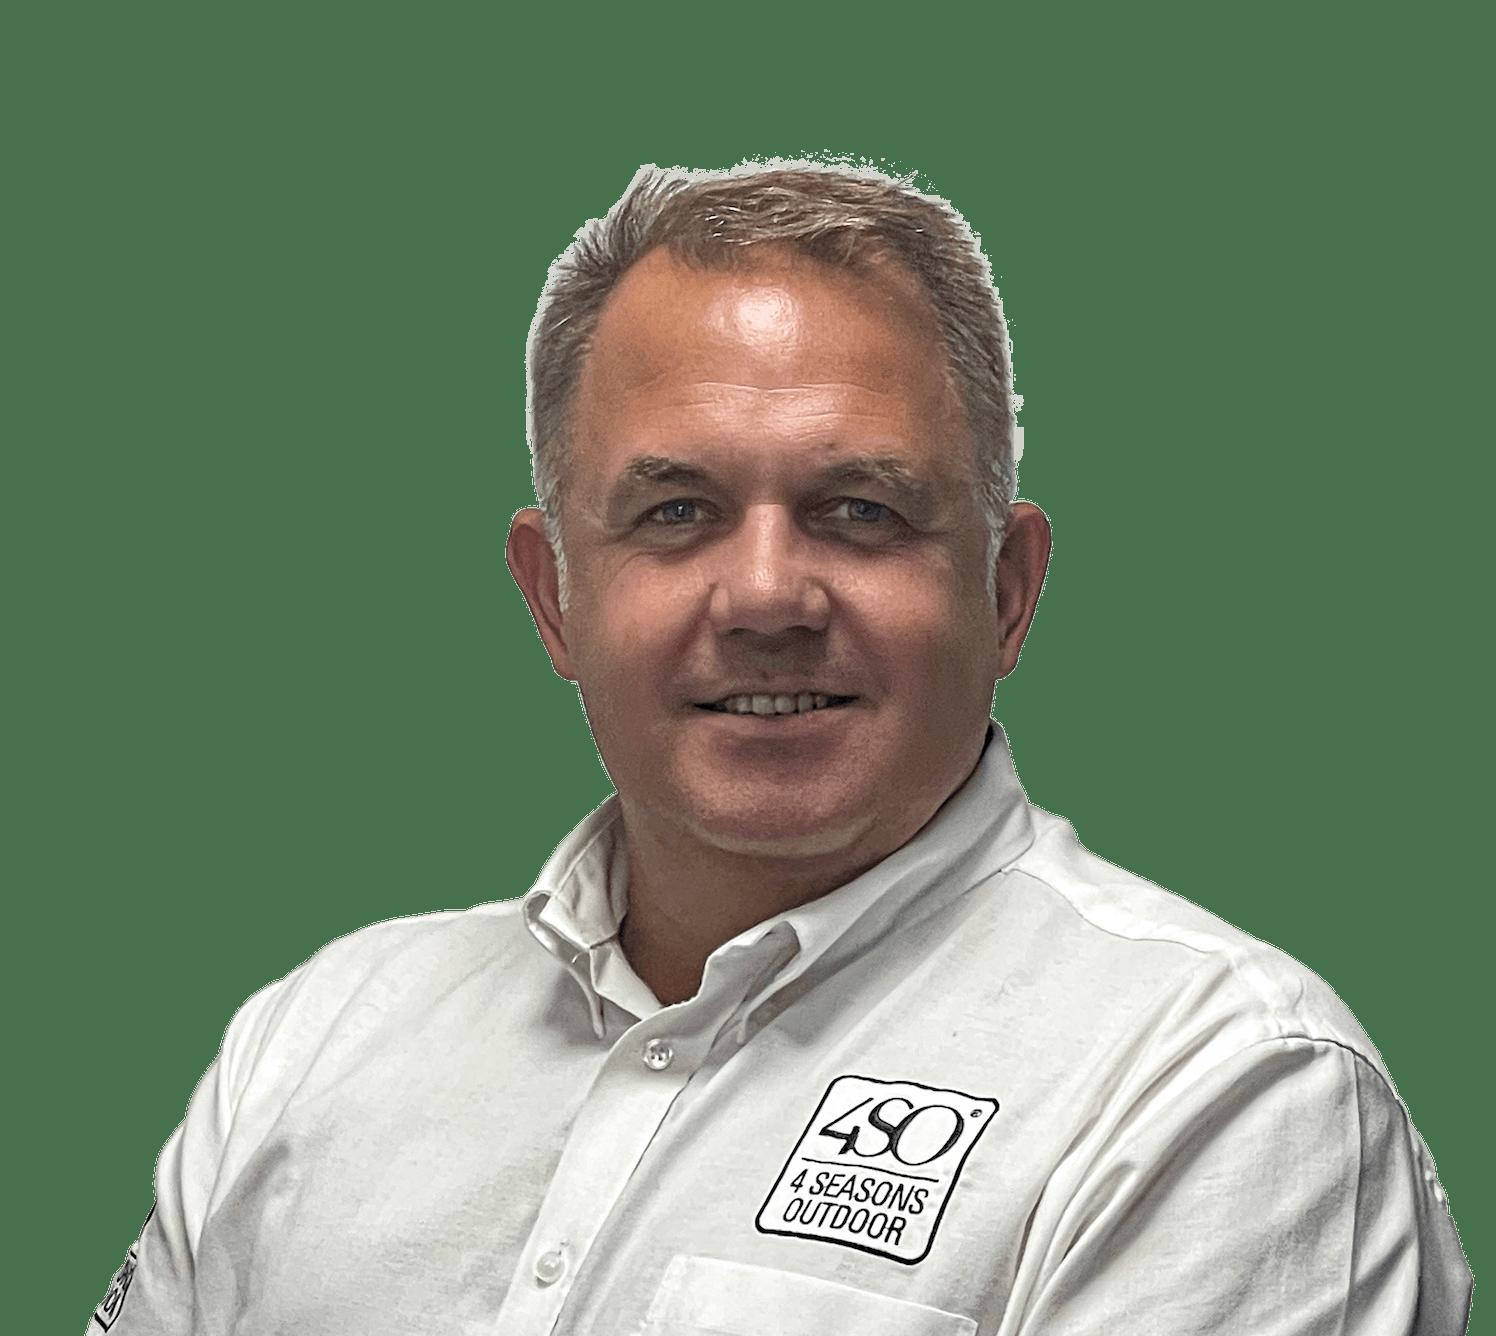 Chris Newman 4 Seasons Outdoor UK